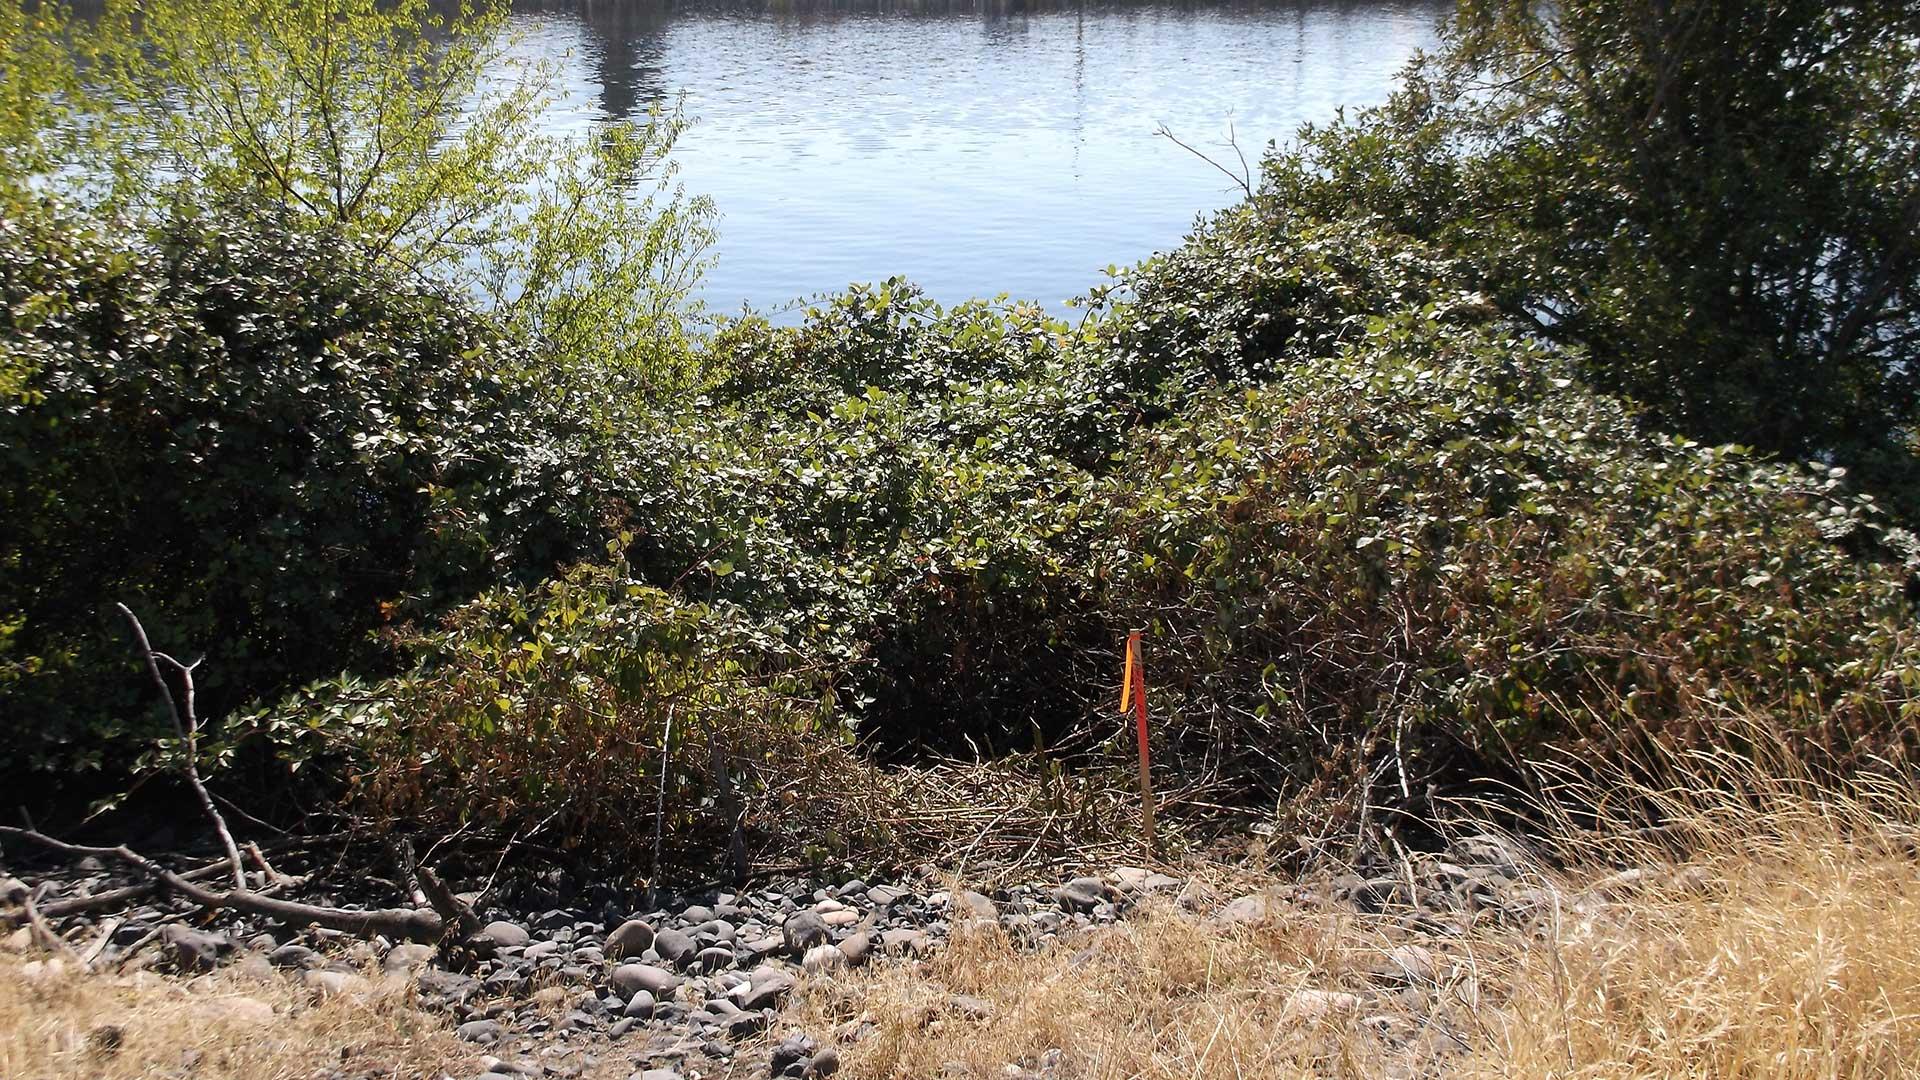 Williams River Profiles - survey